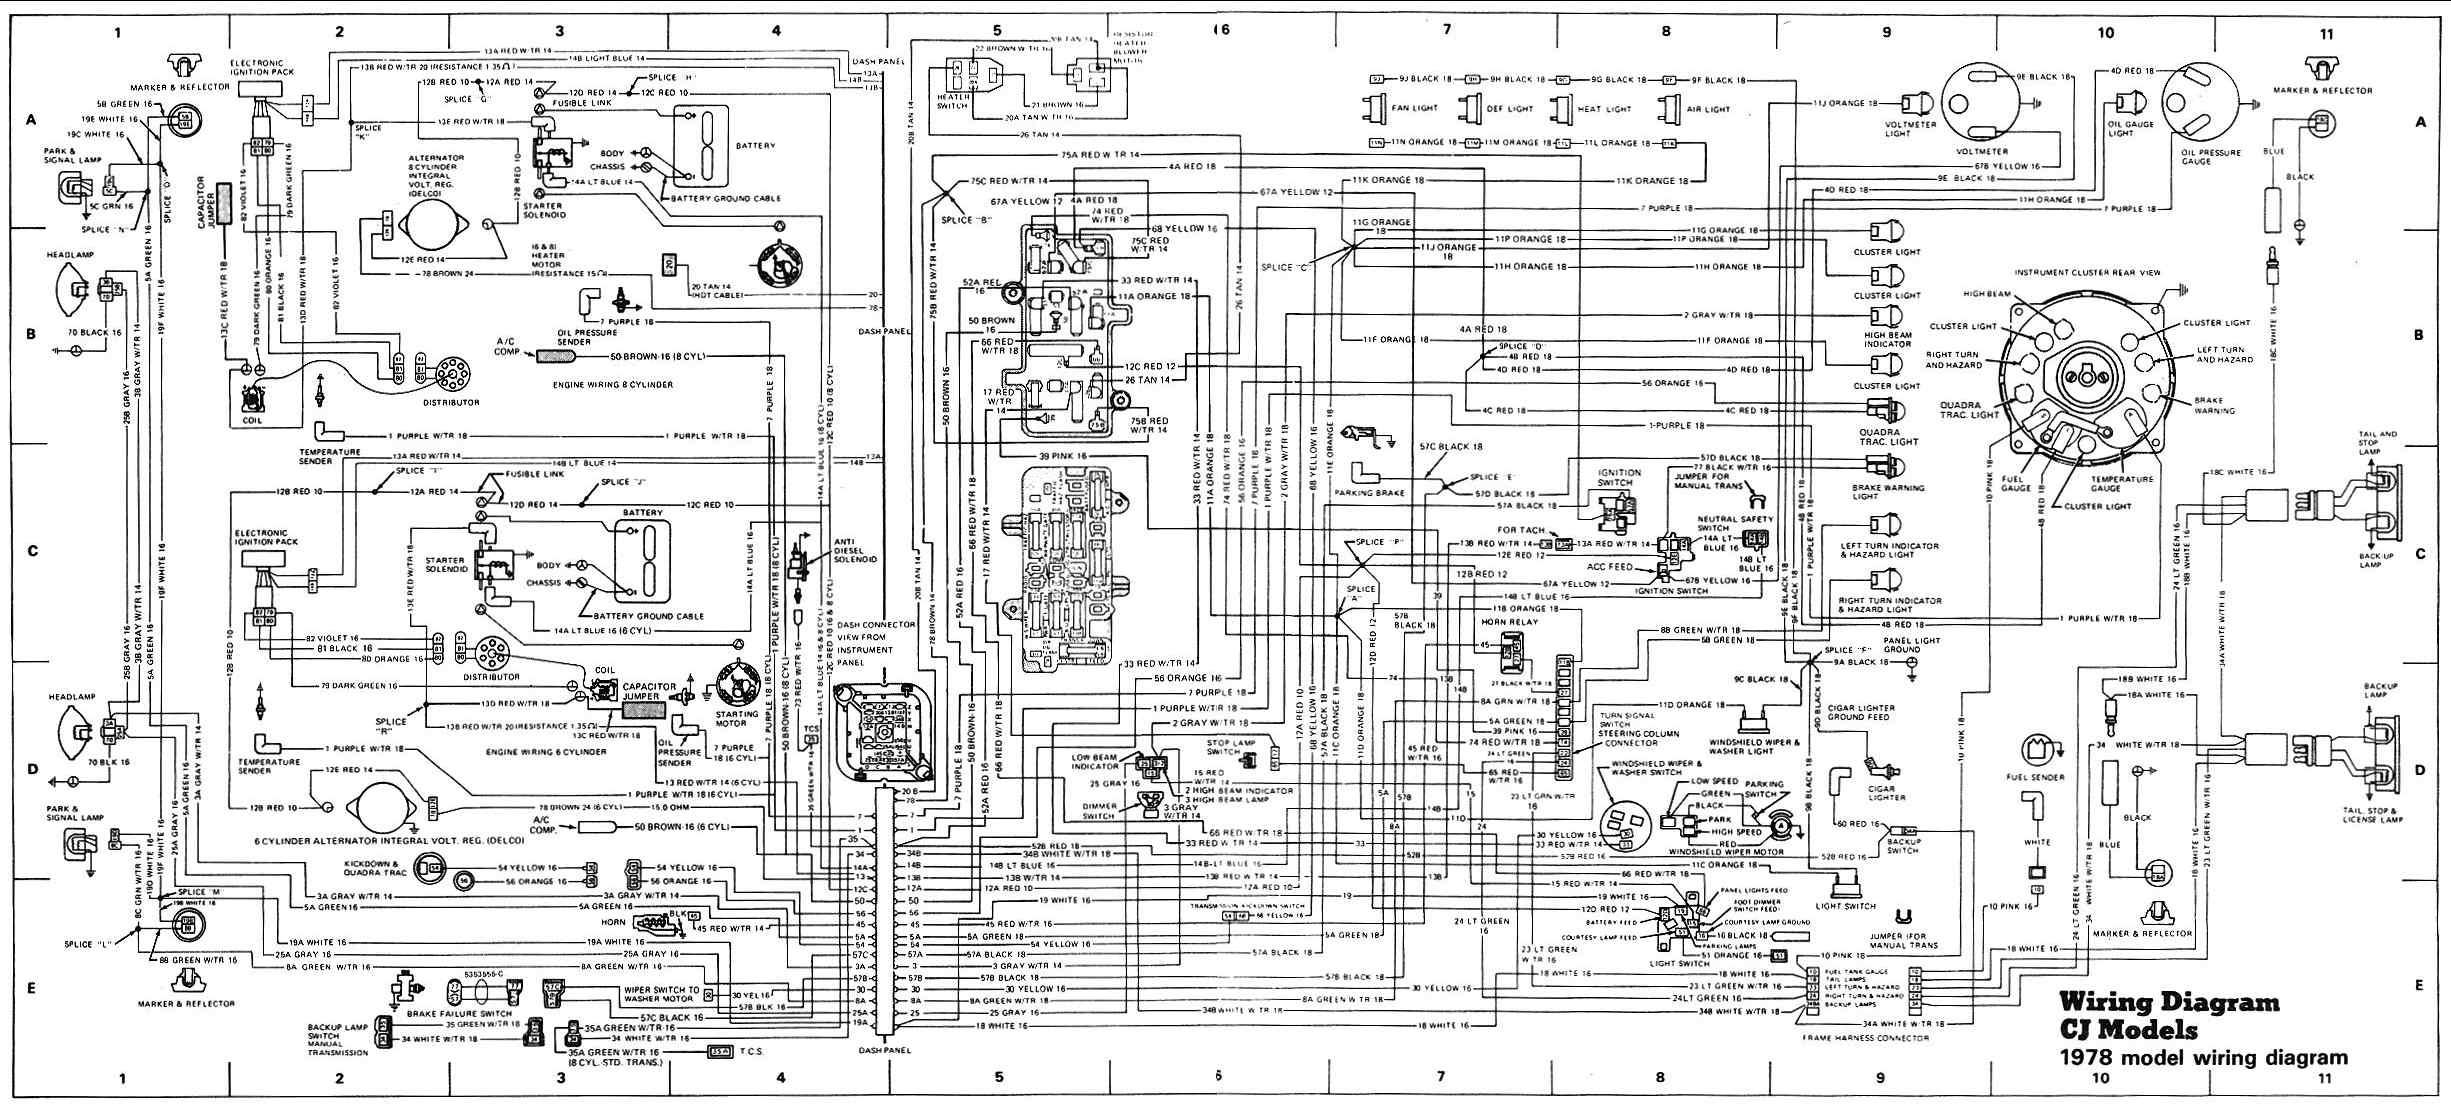 hight resolution of cj8 wiring harness diagram simple wiring post fuse box diagram fuse panel diagram cj8